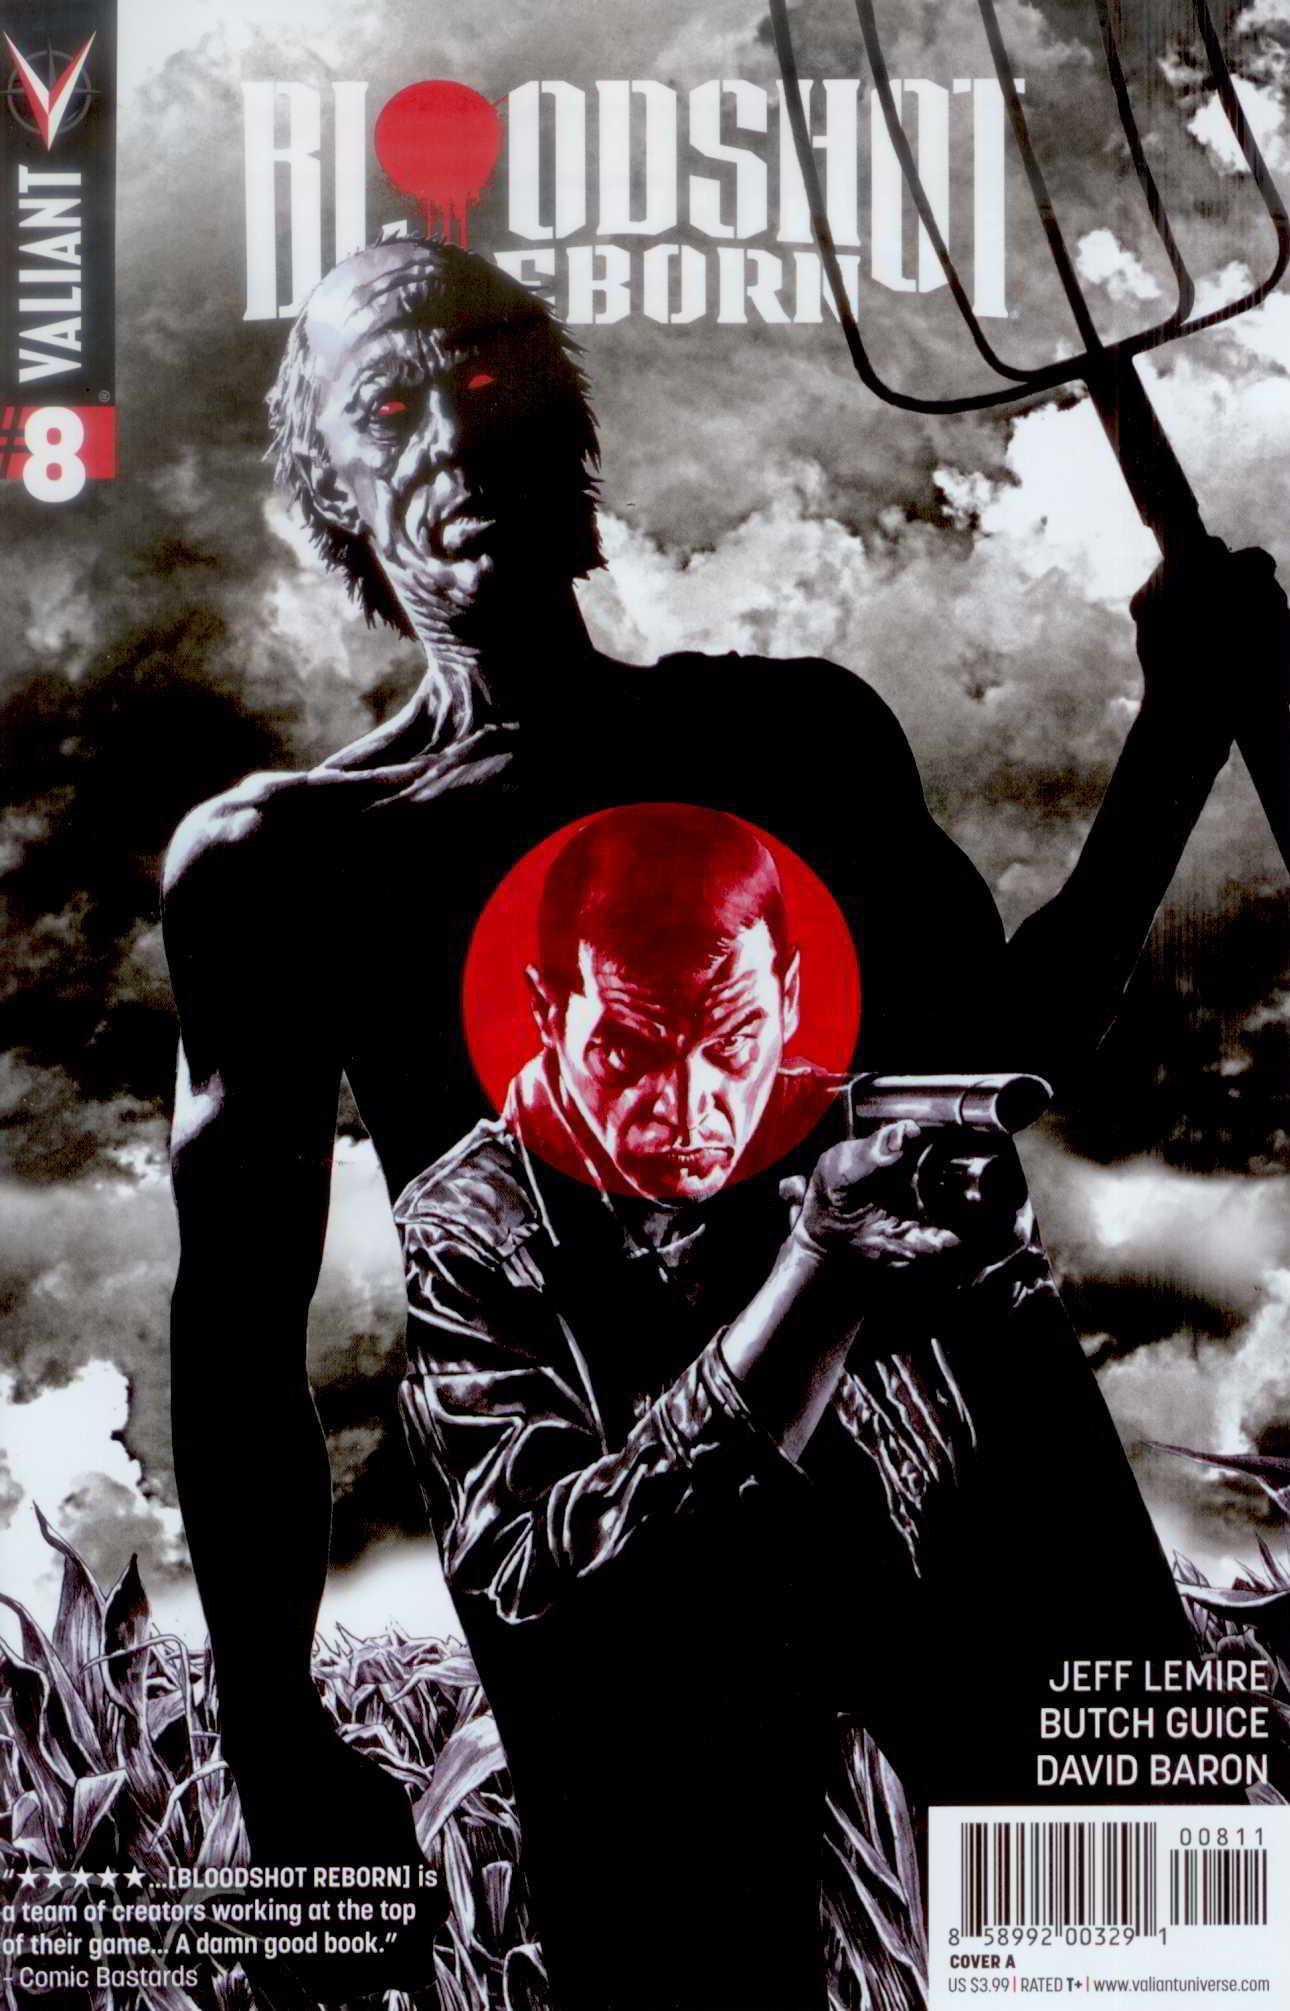 Bloodshot Reborn 8